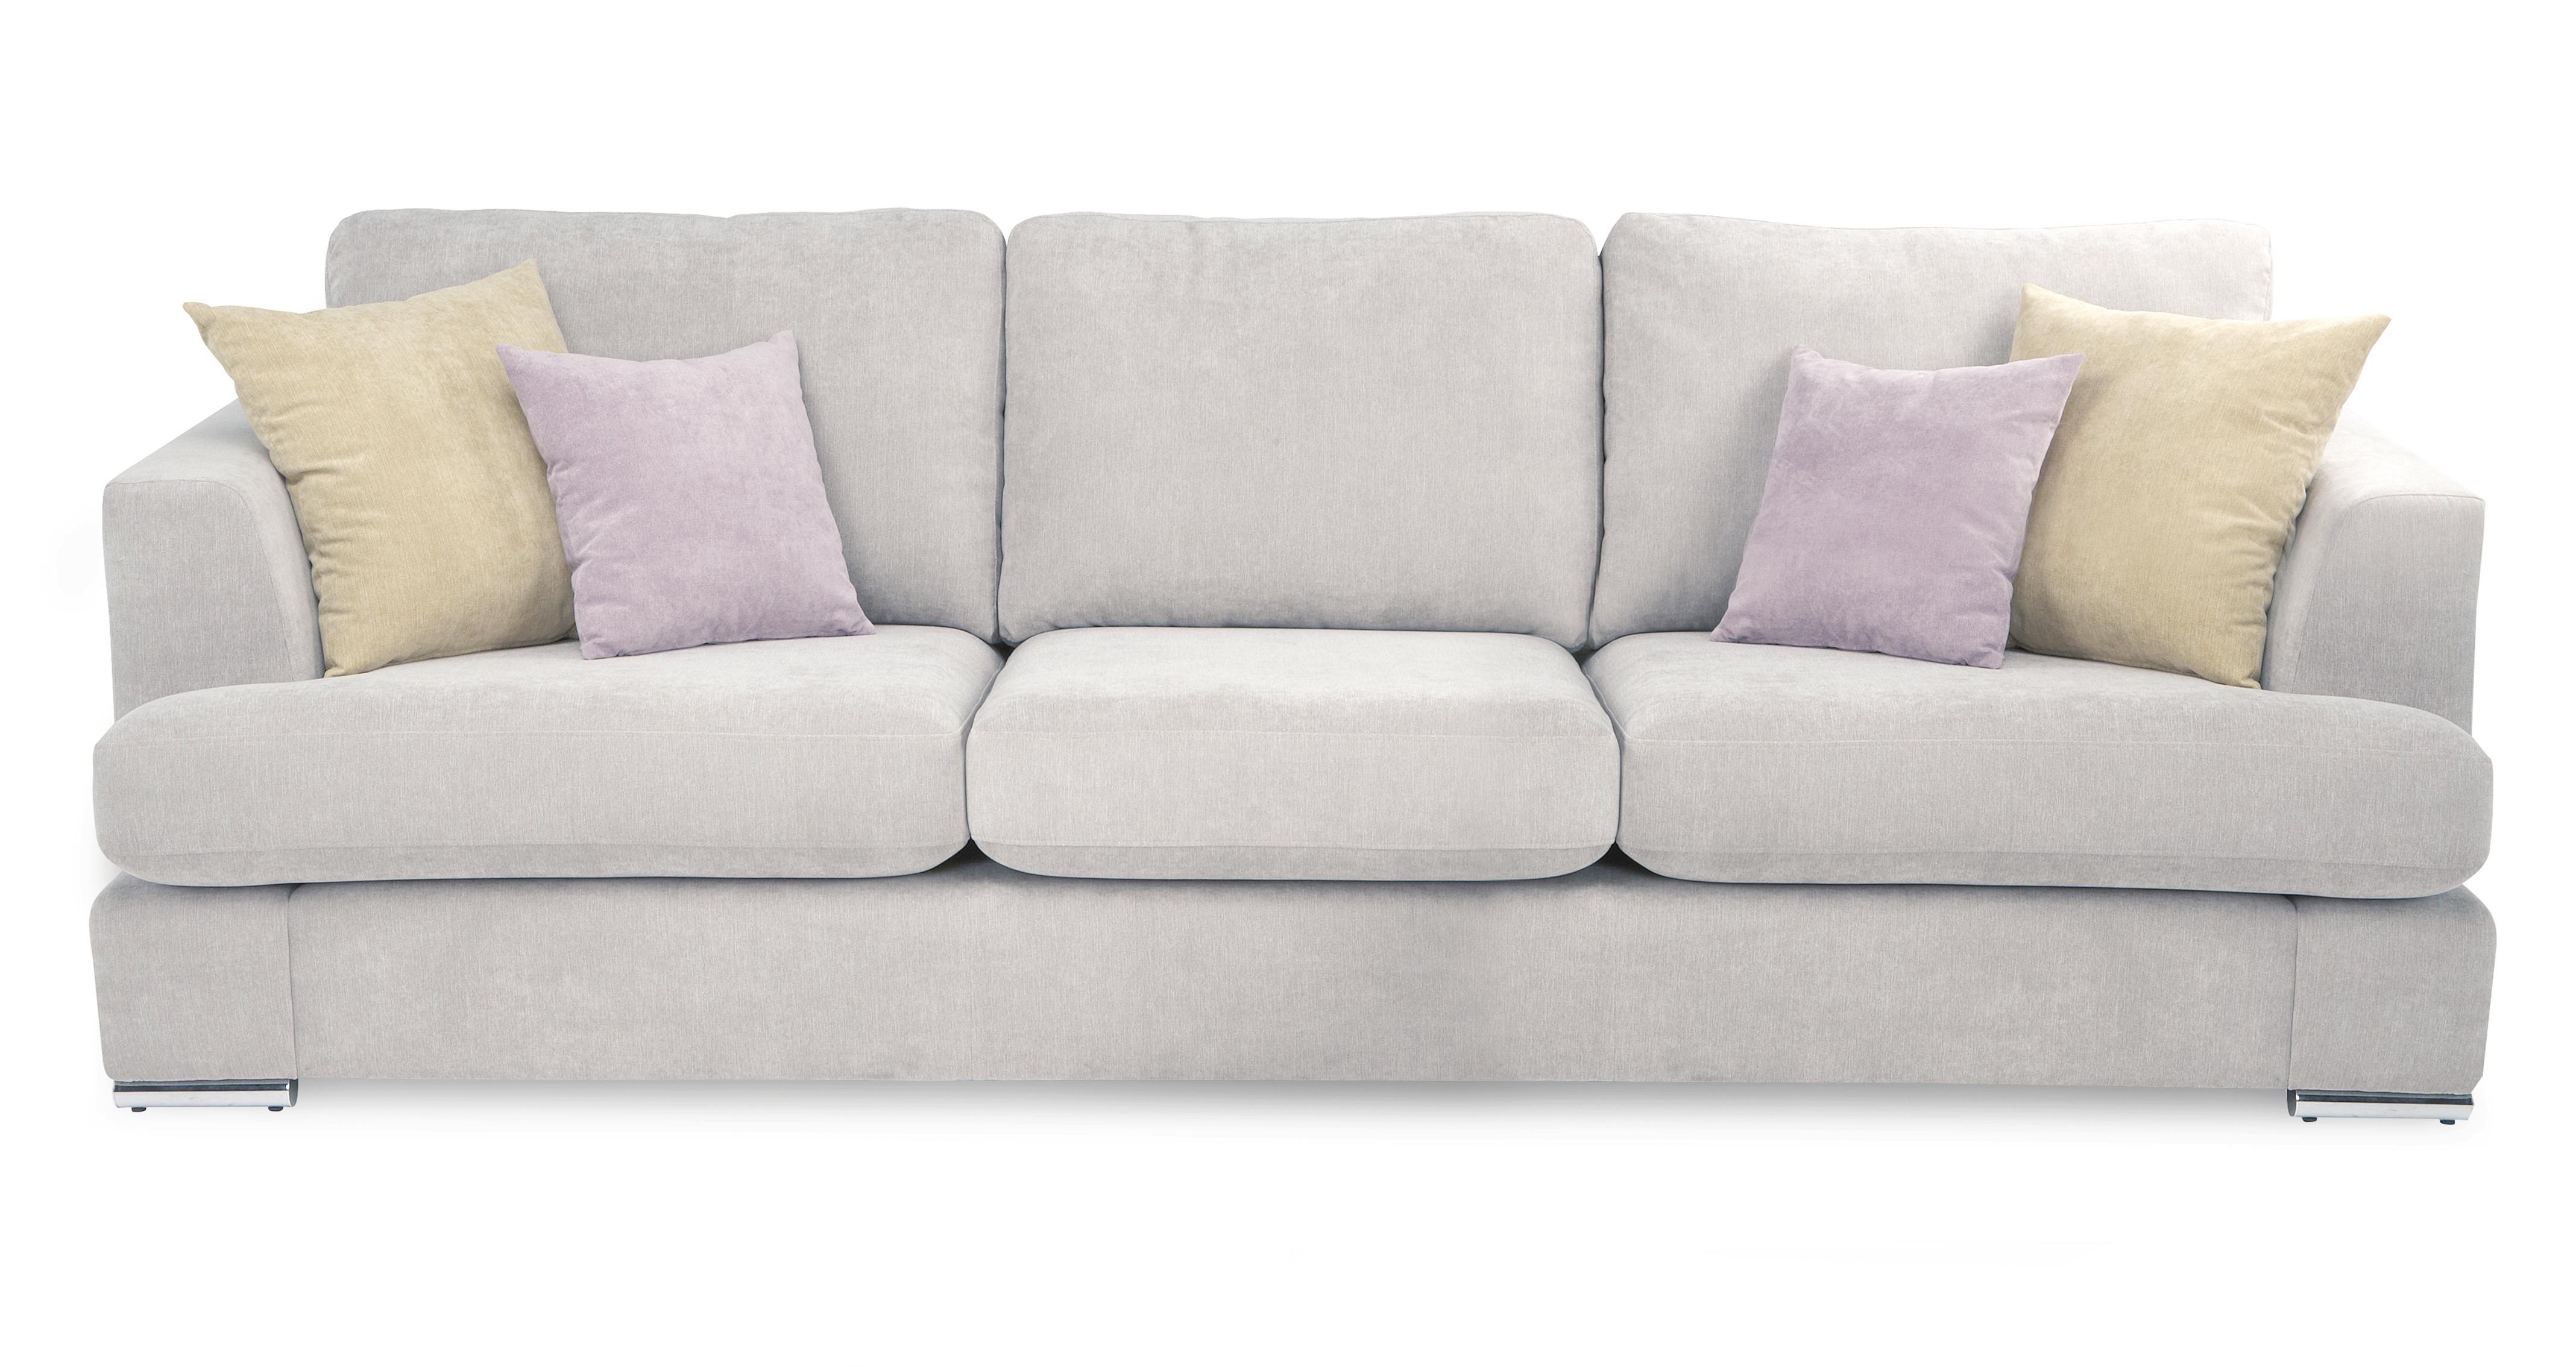 sofa company nl india wooden set design freya 4 zits bank dfs banken